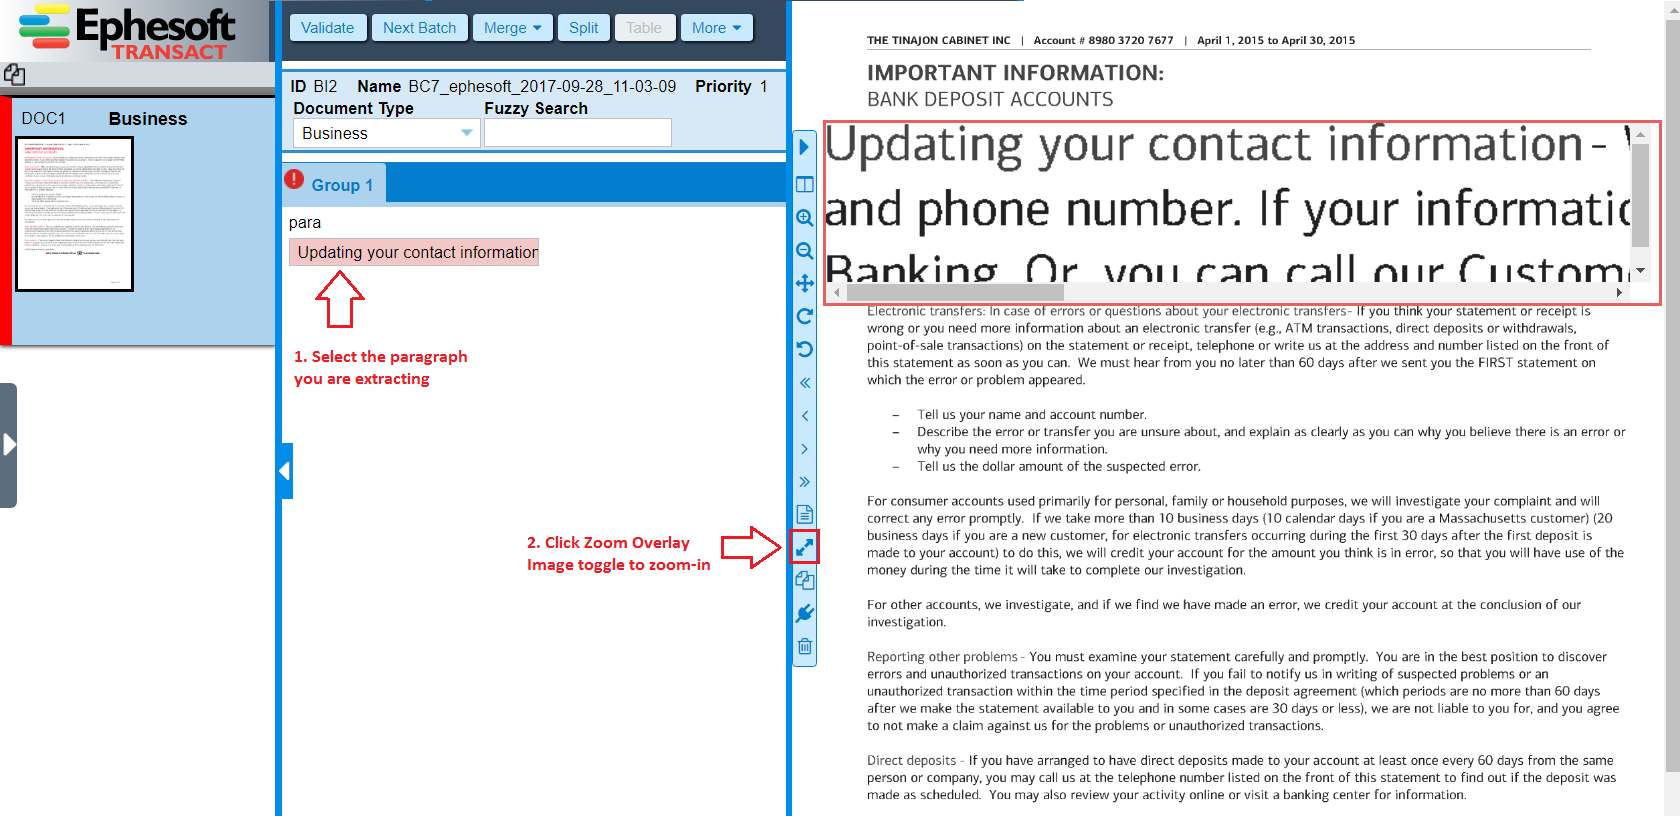 C:\Users\Ephesoft\AppData\Local\Microsoft\Windows\INetCache\Content.Word\5.png